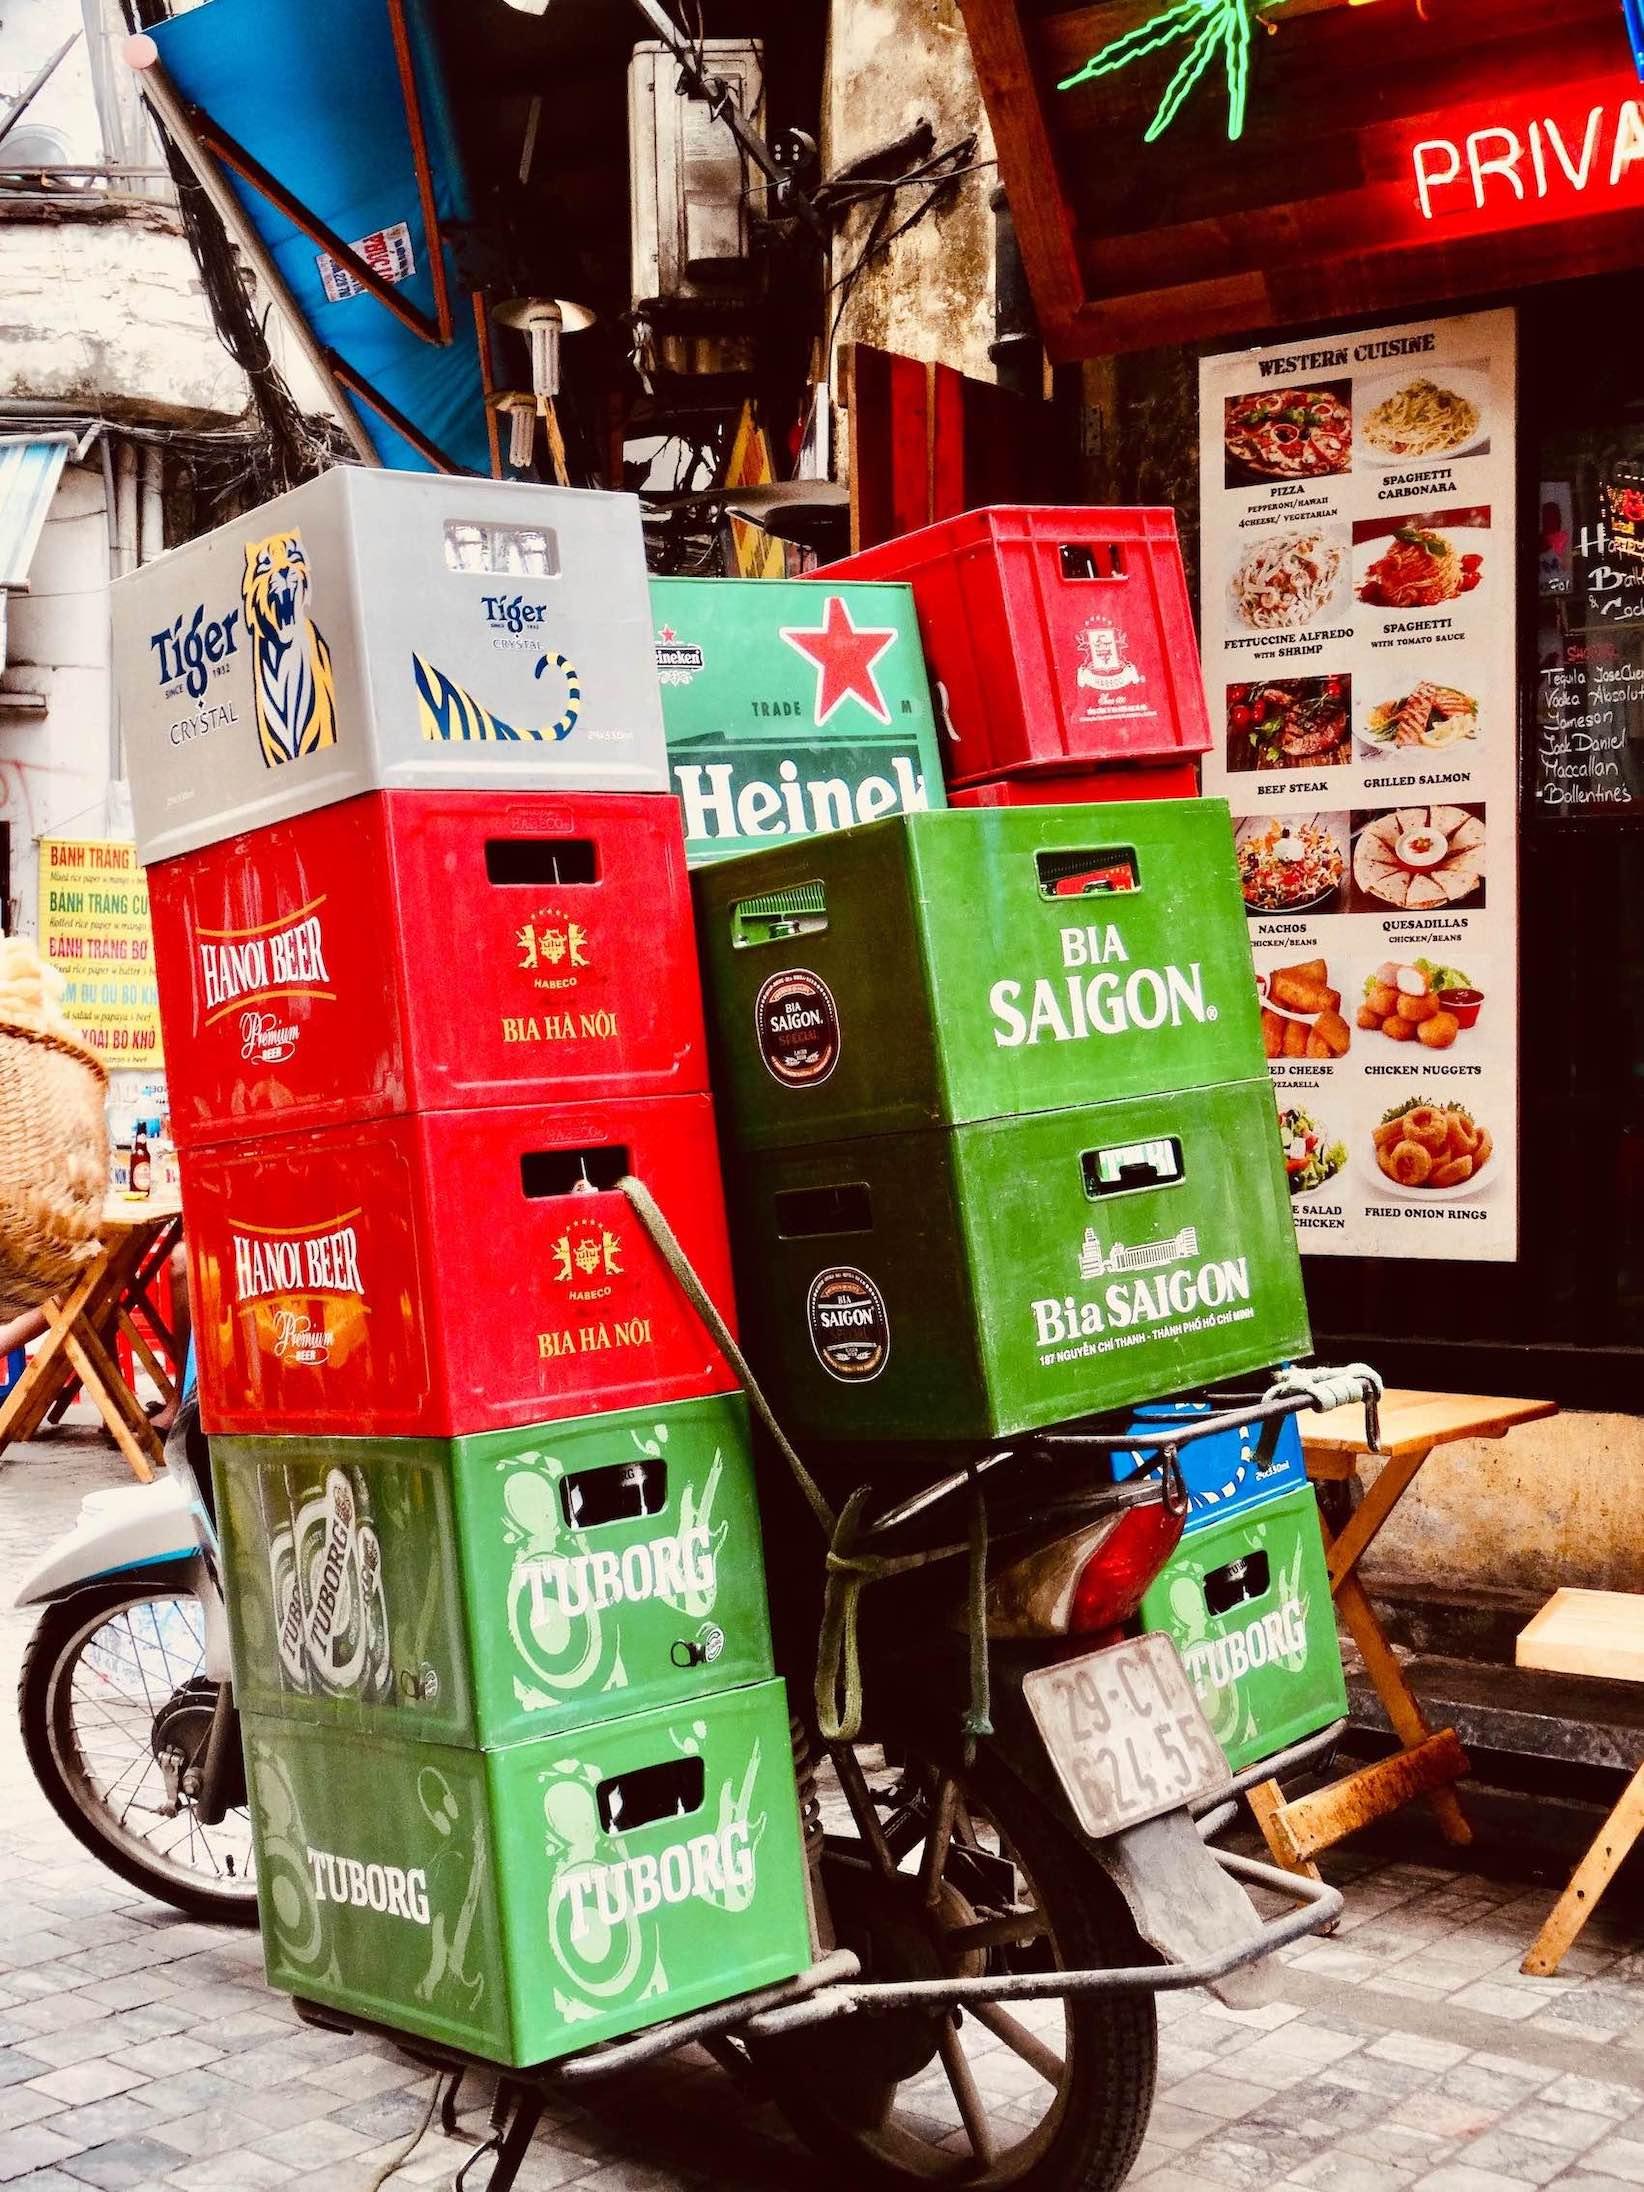 Beer crates in Hanoi Old Quarter.